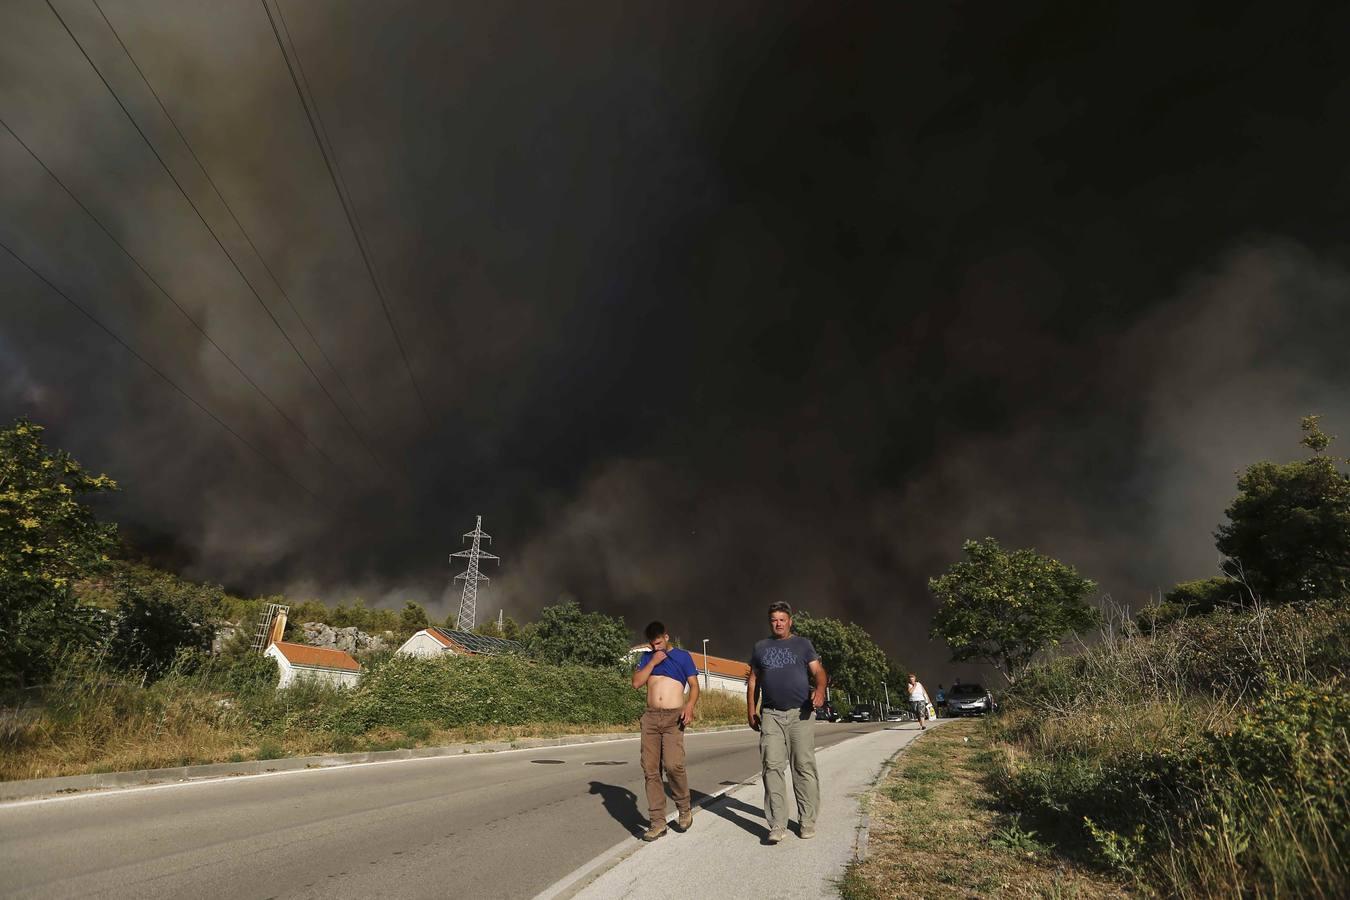 Croacia lucha contra un incendio forestal en Mravinc, cerca de Split